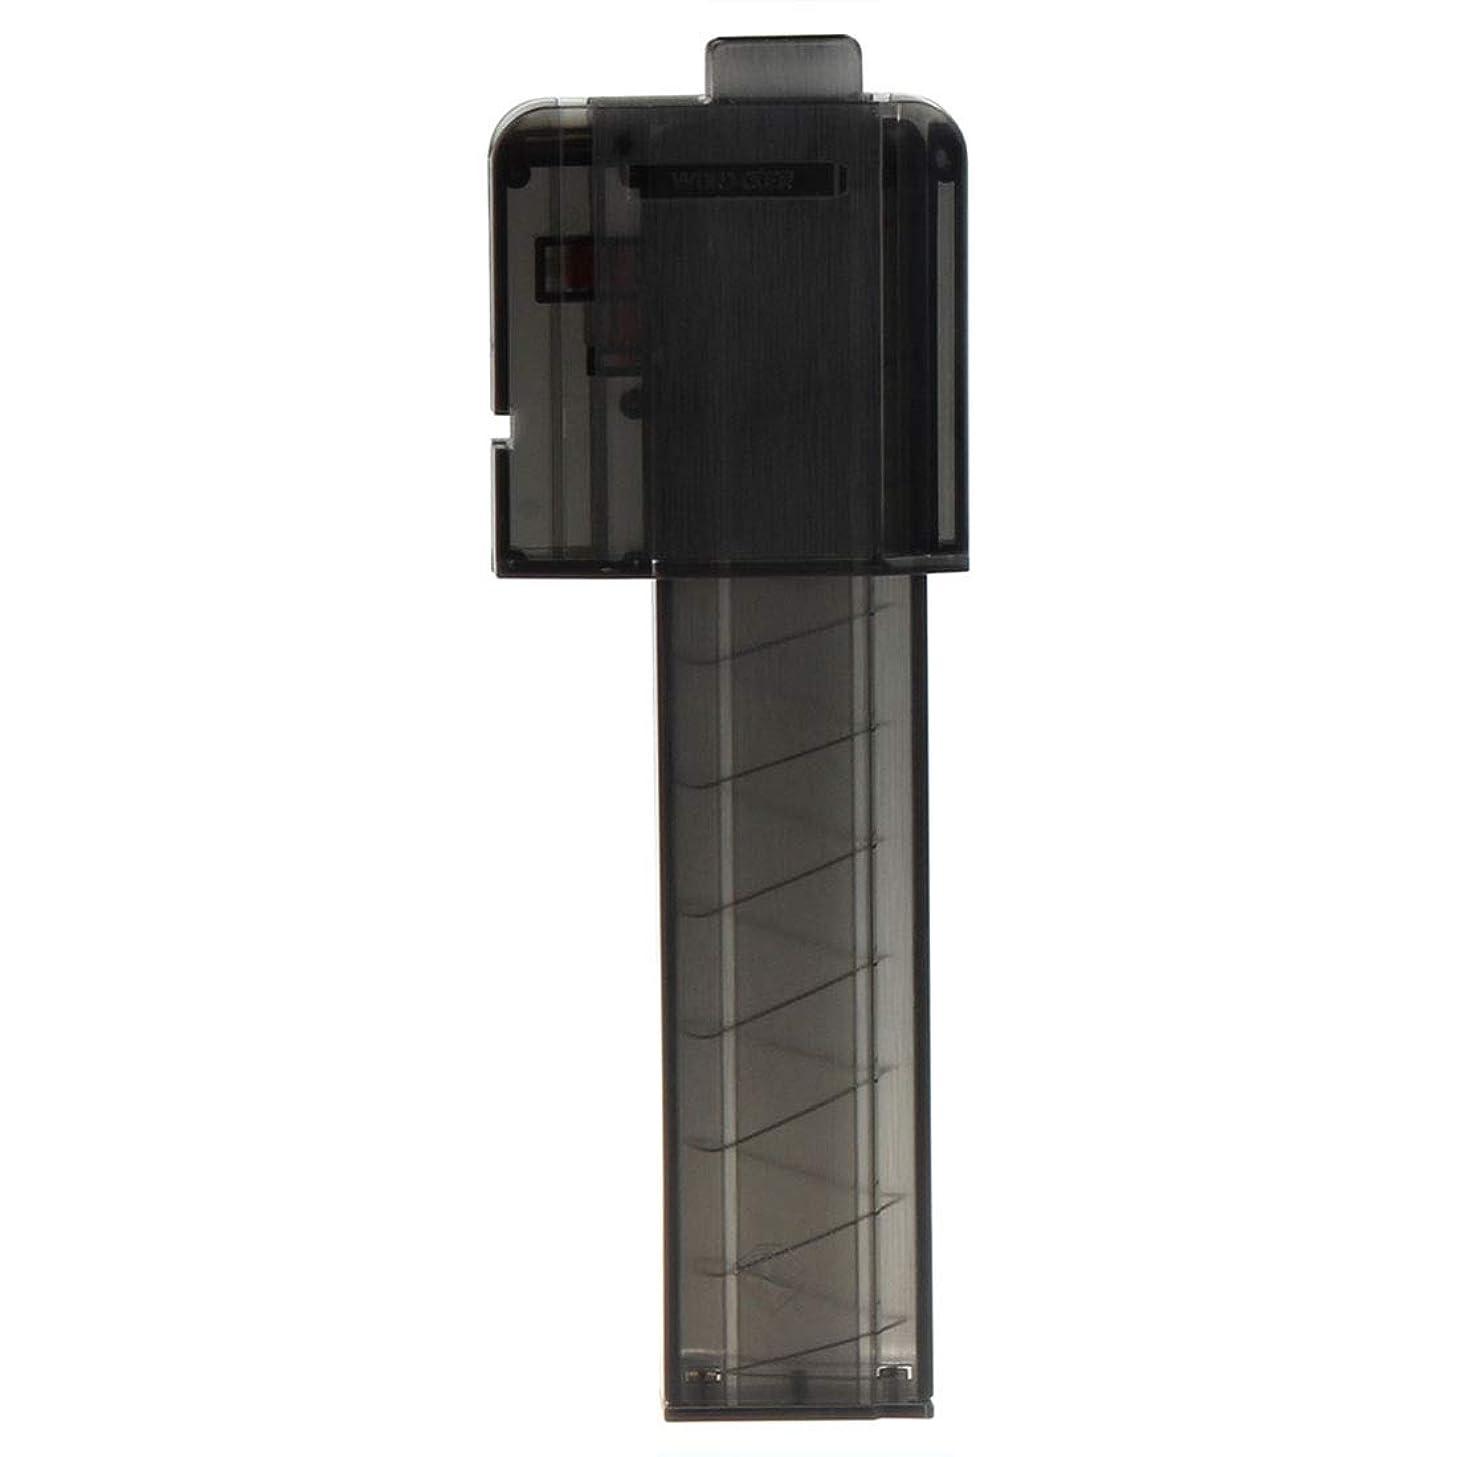 Yamix Worker Narrow Magazines with Worker Clip Neck Adaptor, 18-Dart Short Darts Magazine Quick Reload Clip with Worker Talon (Transparent Black)